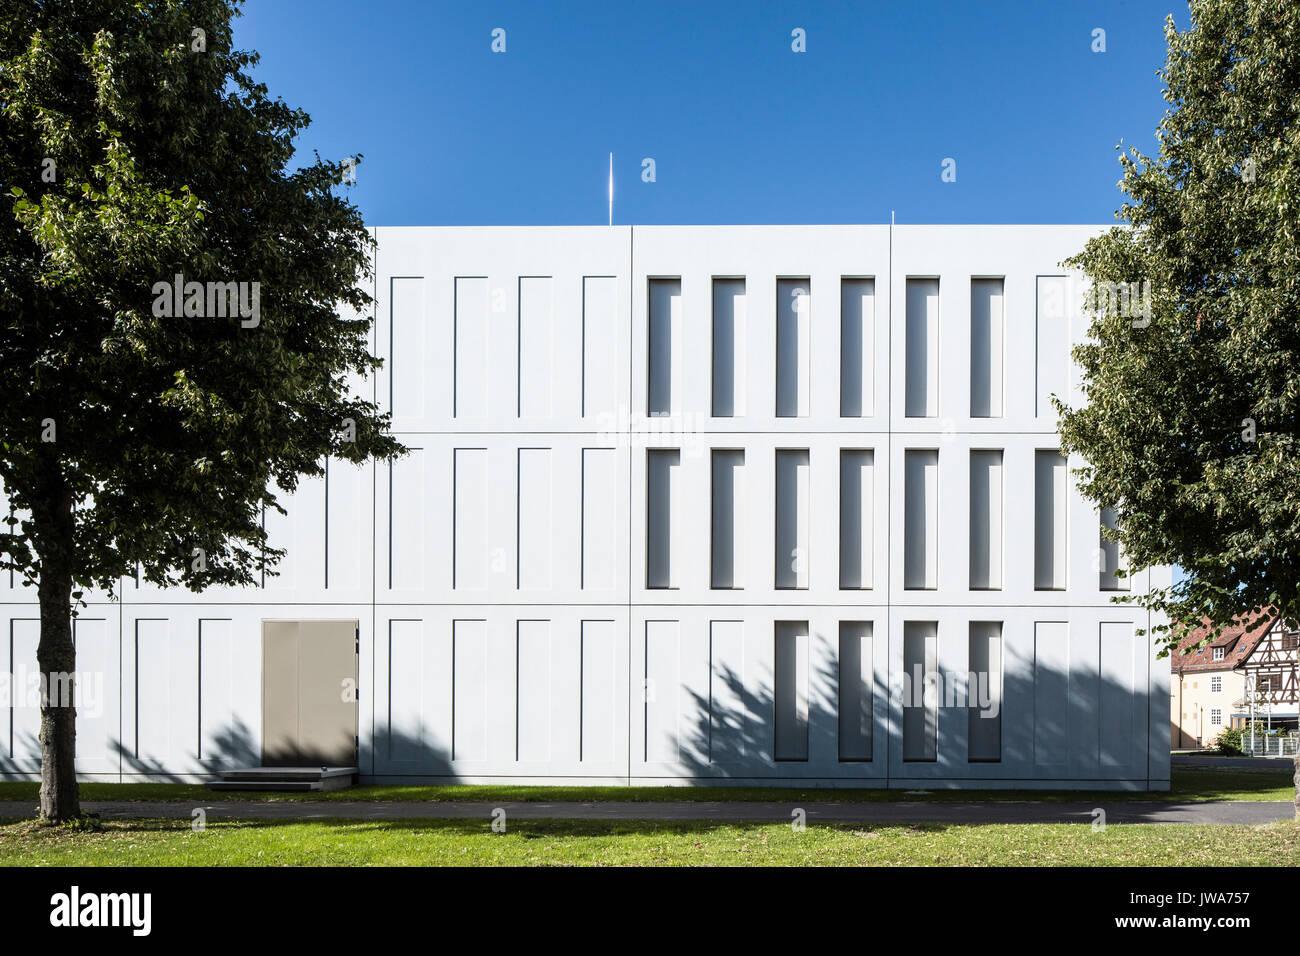 Architekten Biberach elevation of sunlit rear facade finanzamt finance office biberach